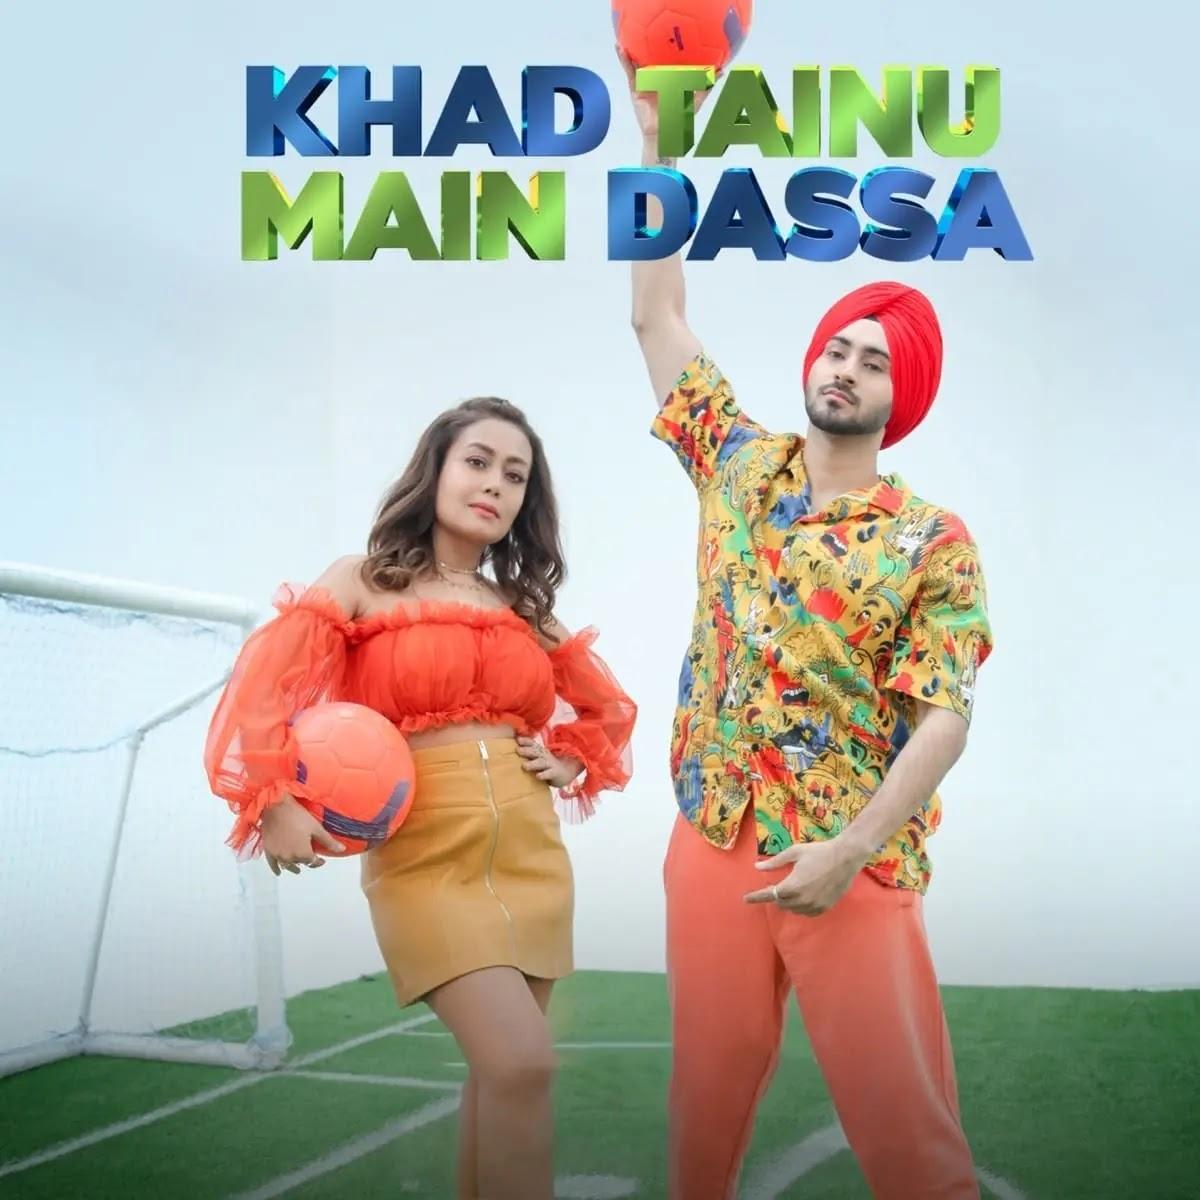 Khad Tenu Main Dassa Neha Kakkar Mp3 Song Download 320kbps